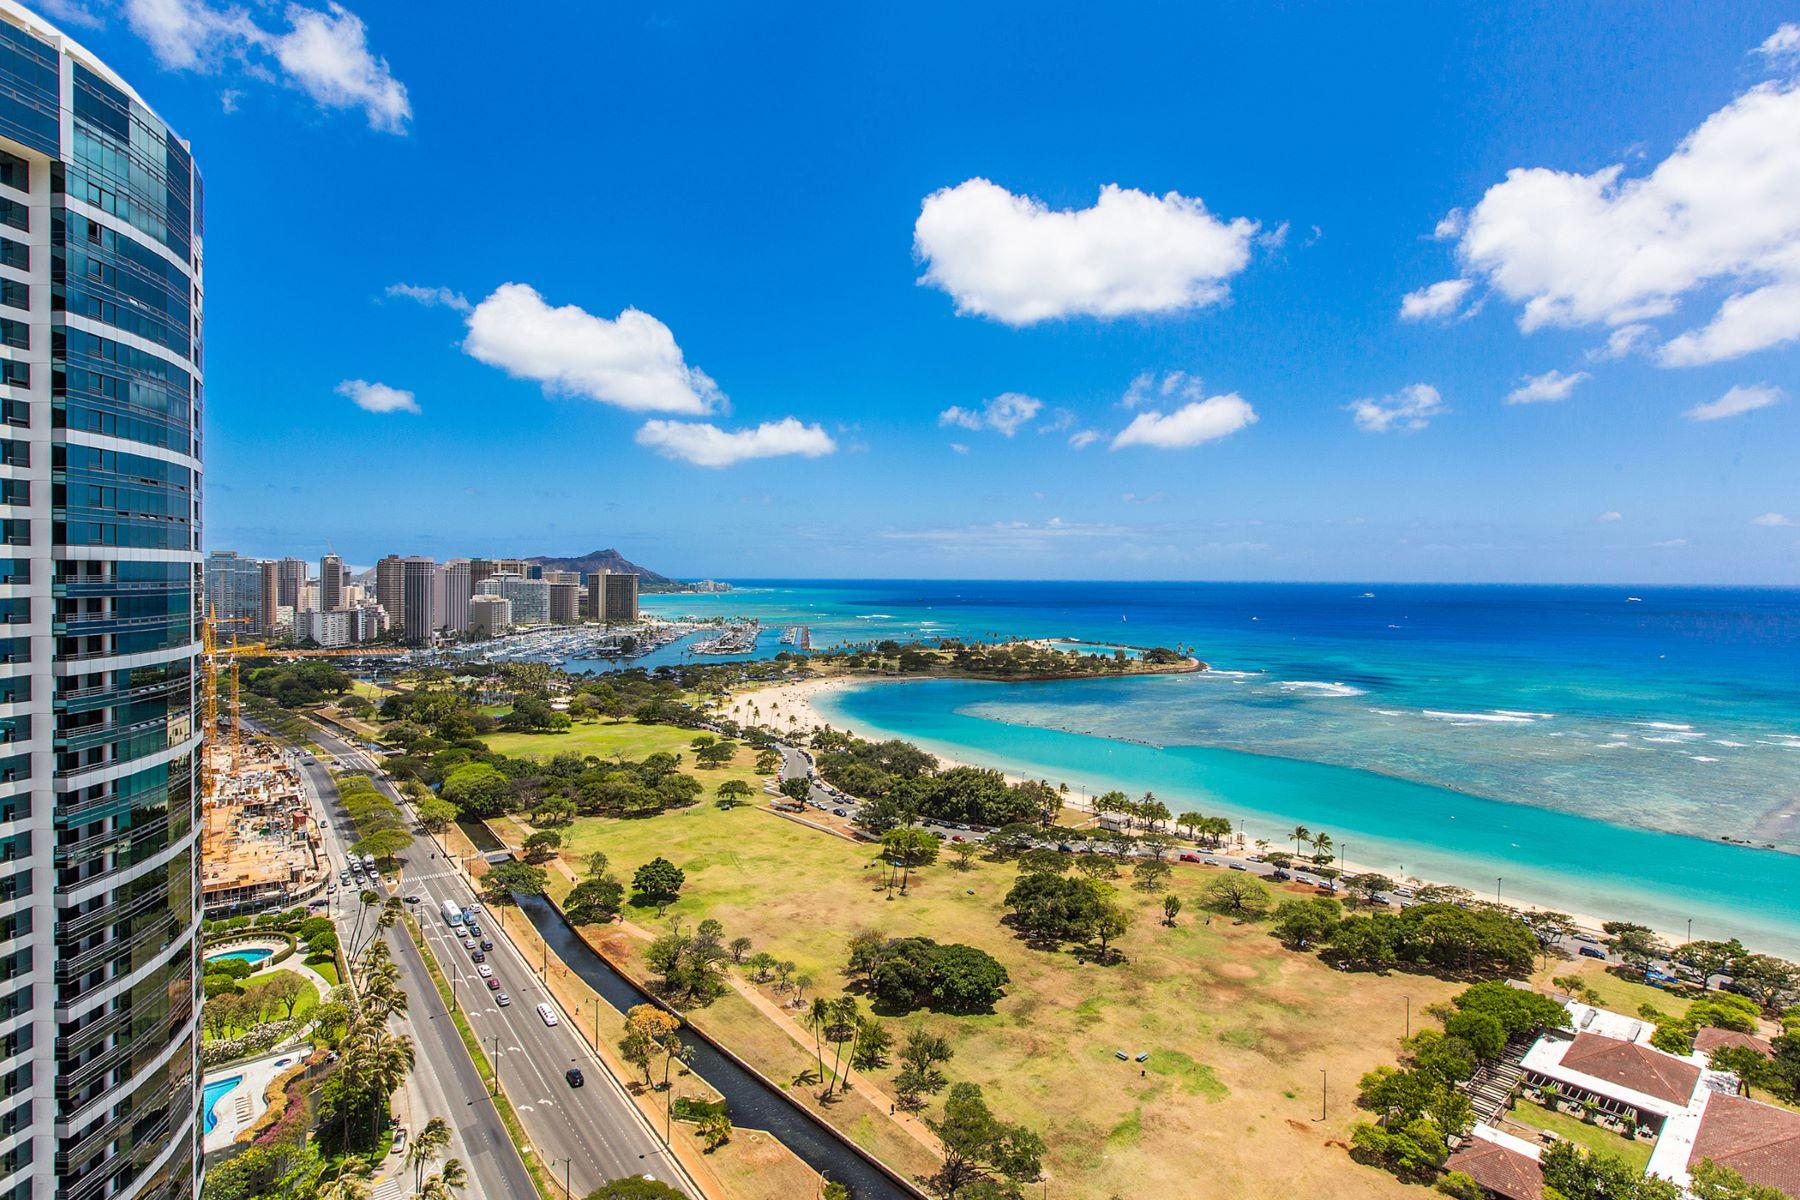 Condominium for Sale at Premier Ocean Views 1288 Ala Moana Boulevard #29E Honolulu, Hawaii 96814 United States